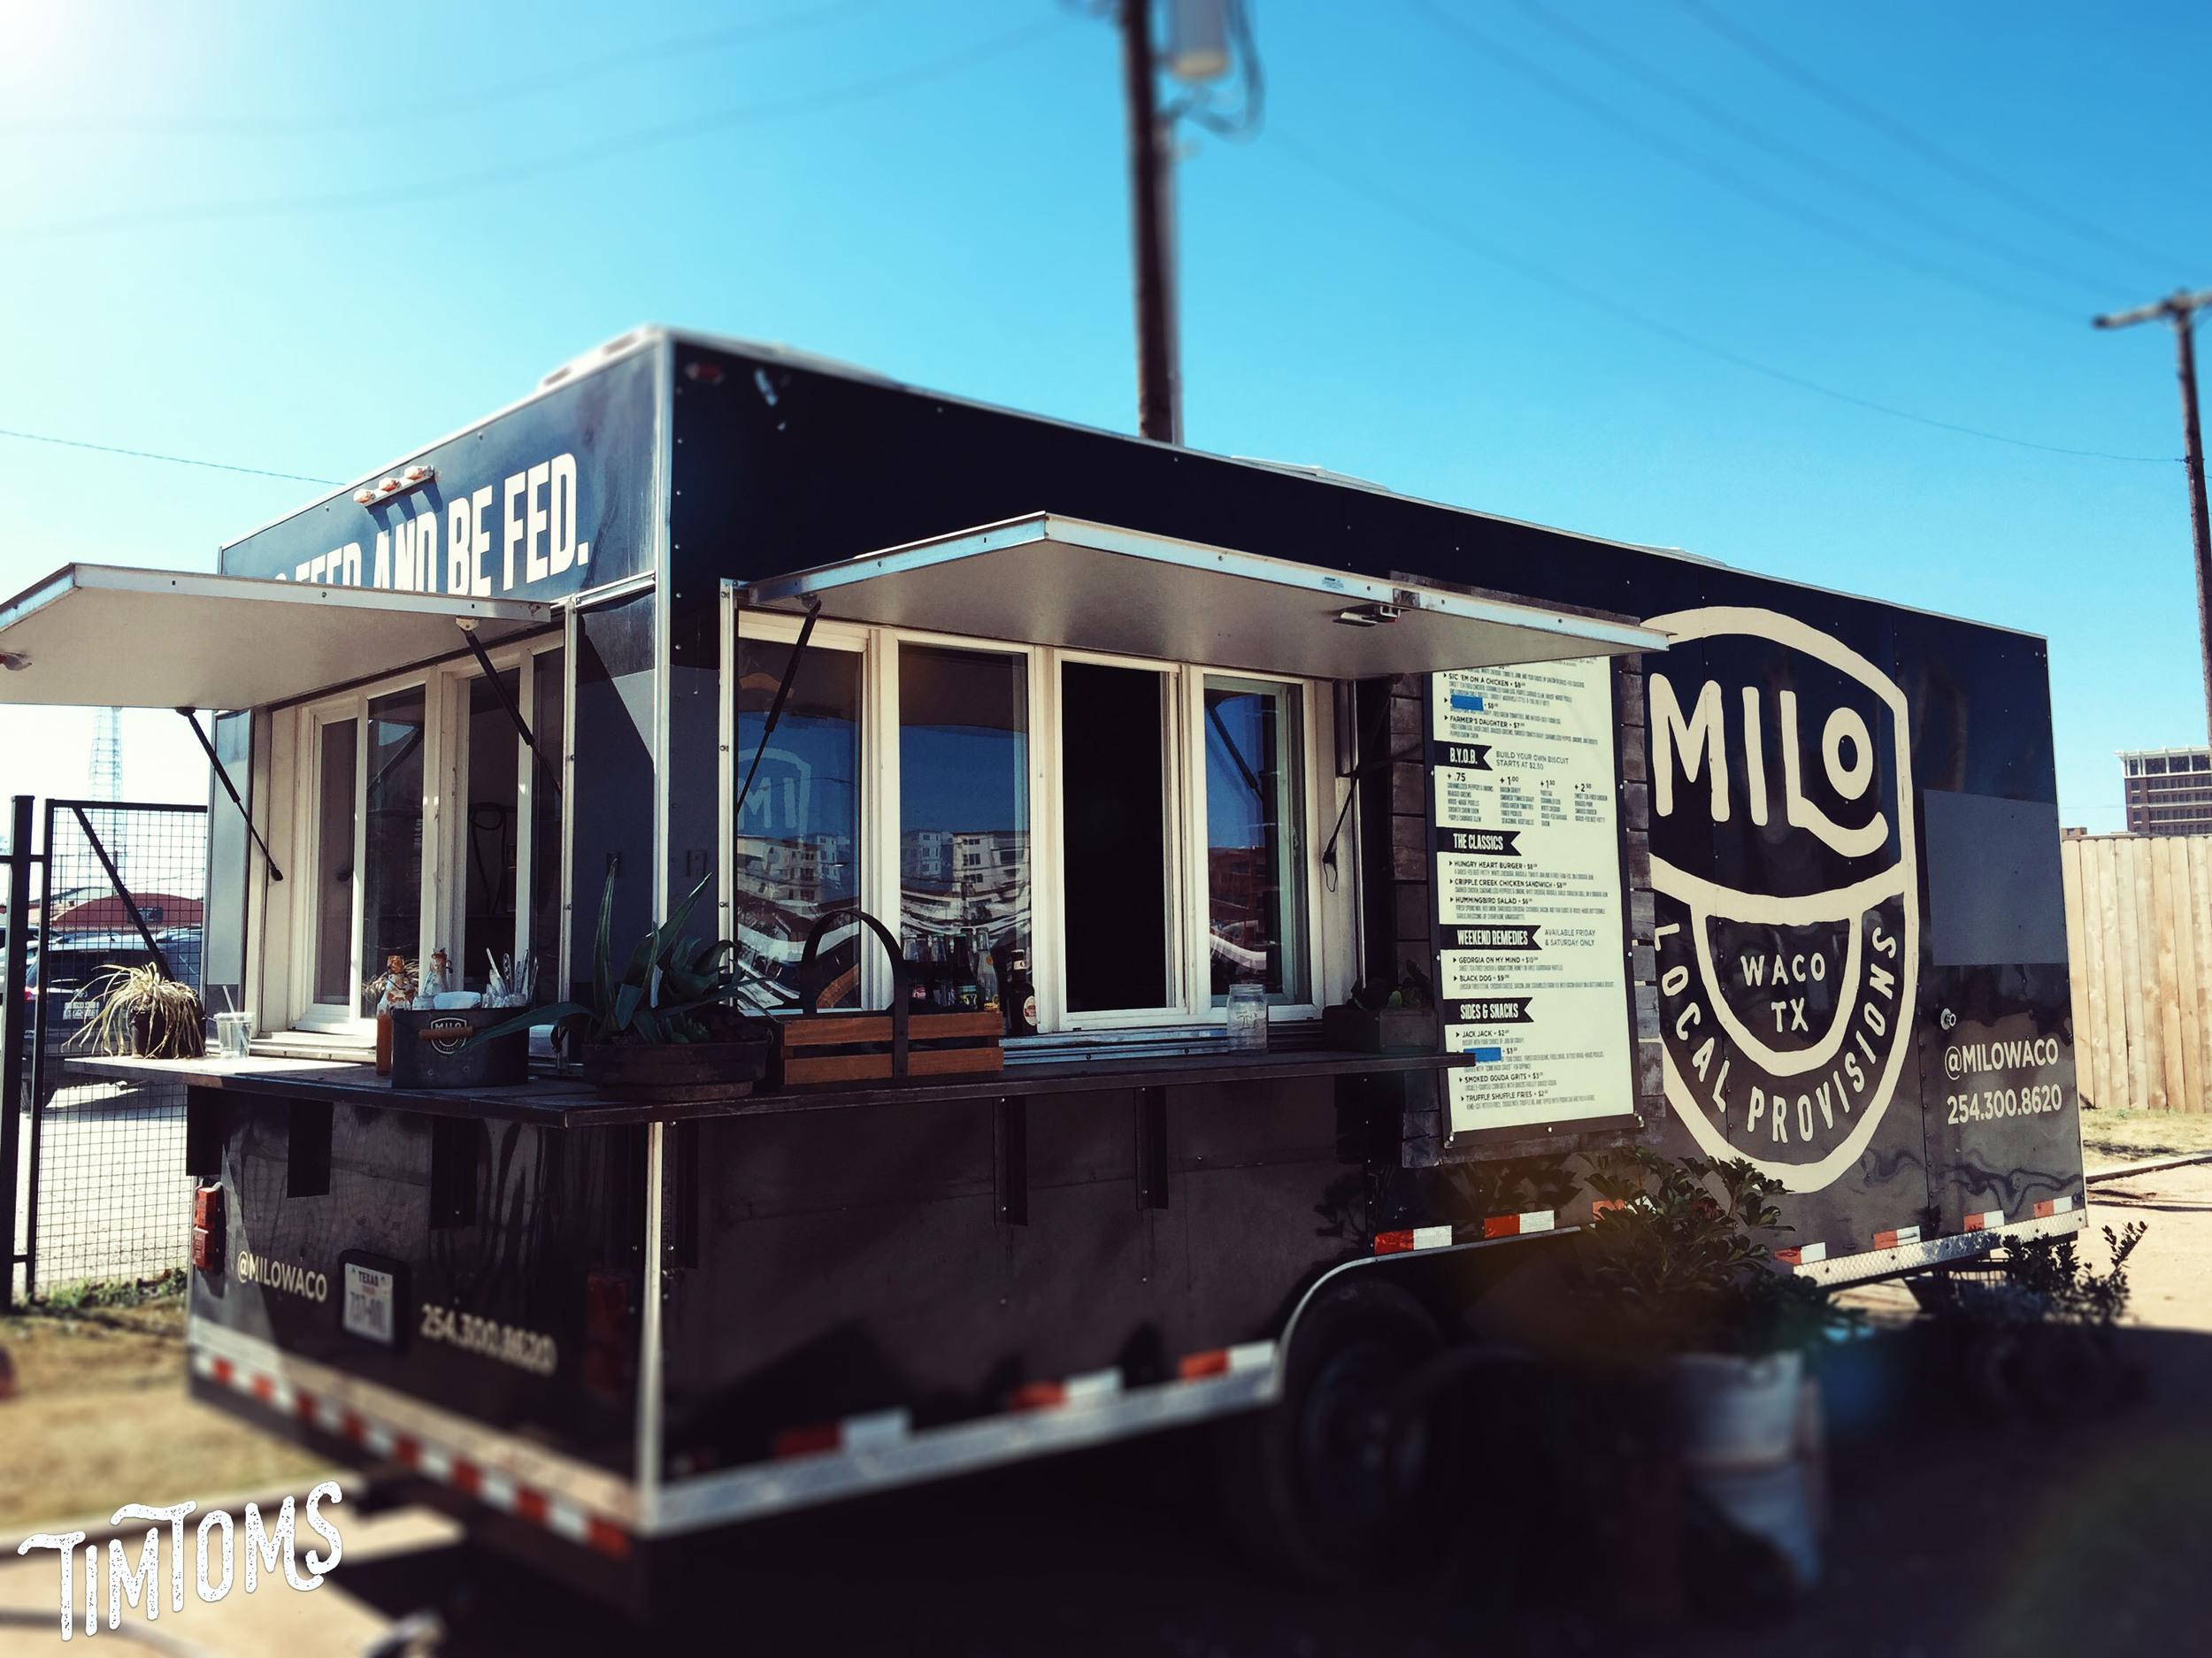 Milo Food Truck Magnolia Market Waco Texas